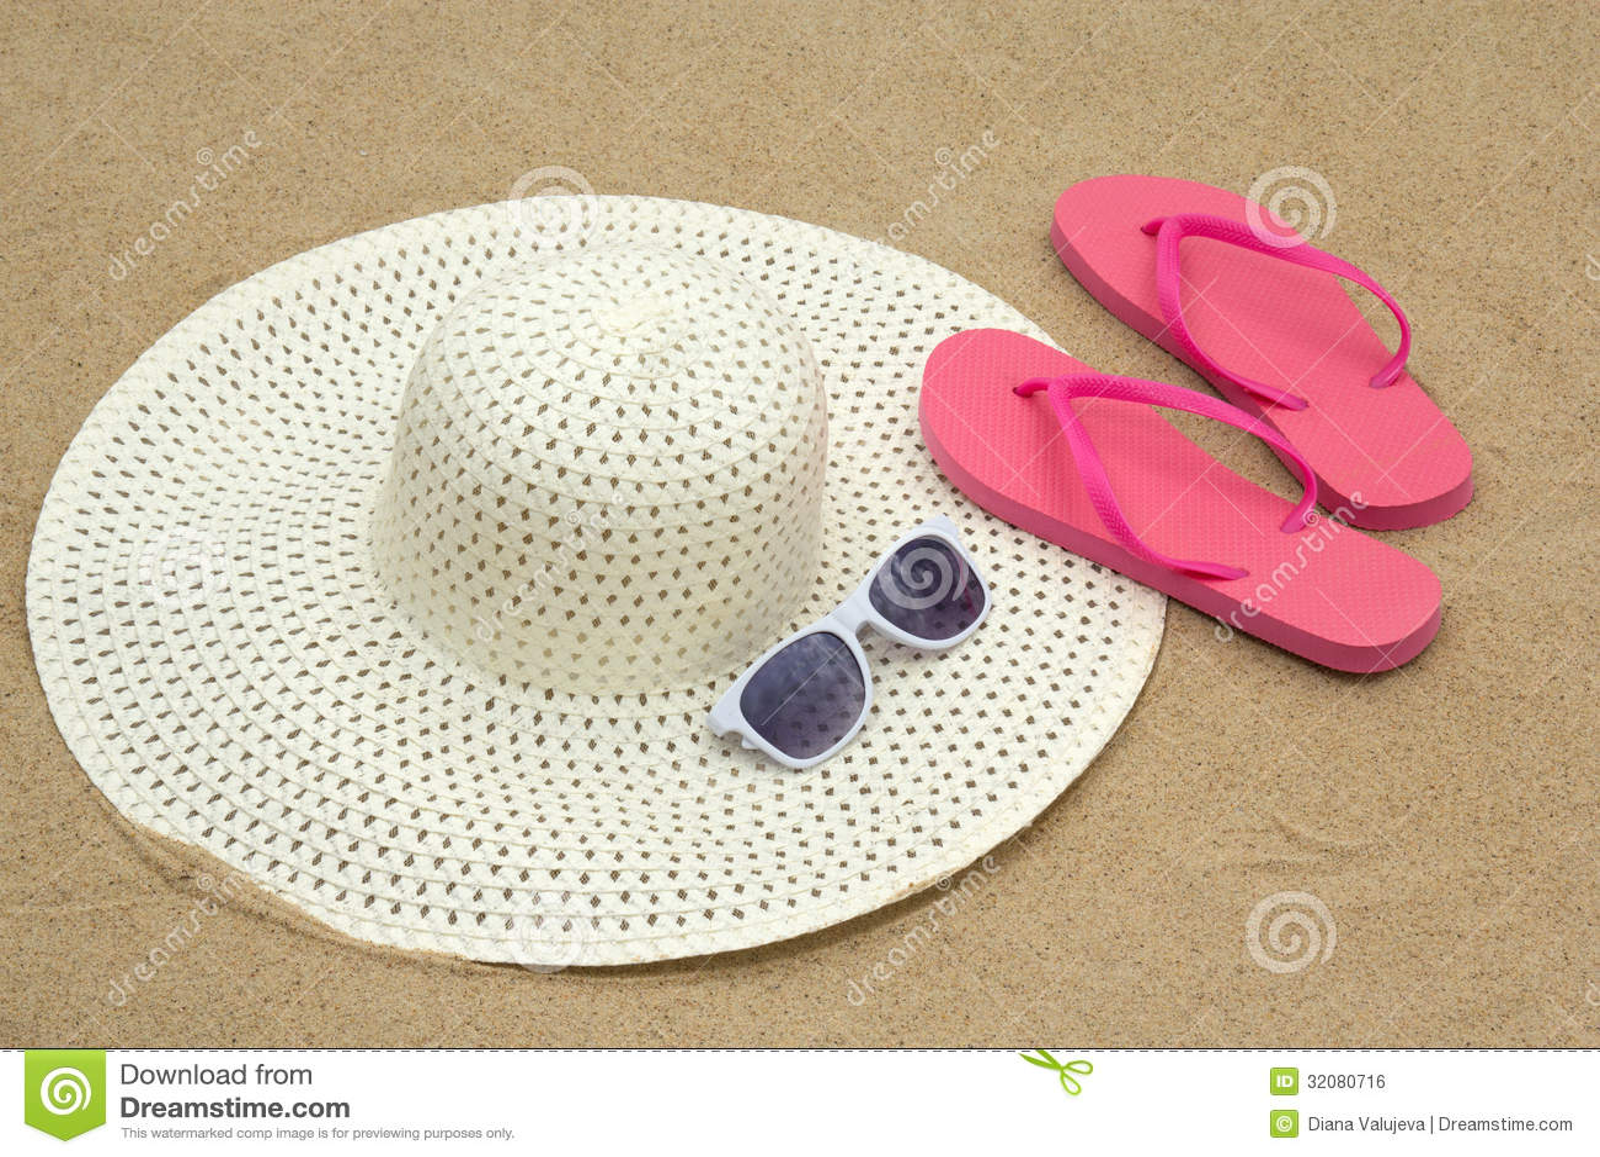 pink flip flops sunglasses  hat  beach sand royalty